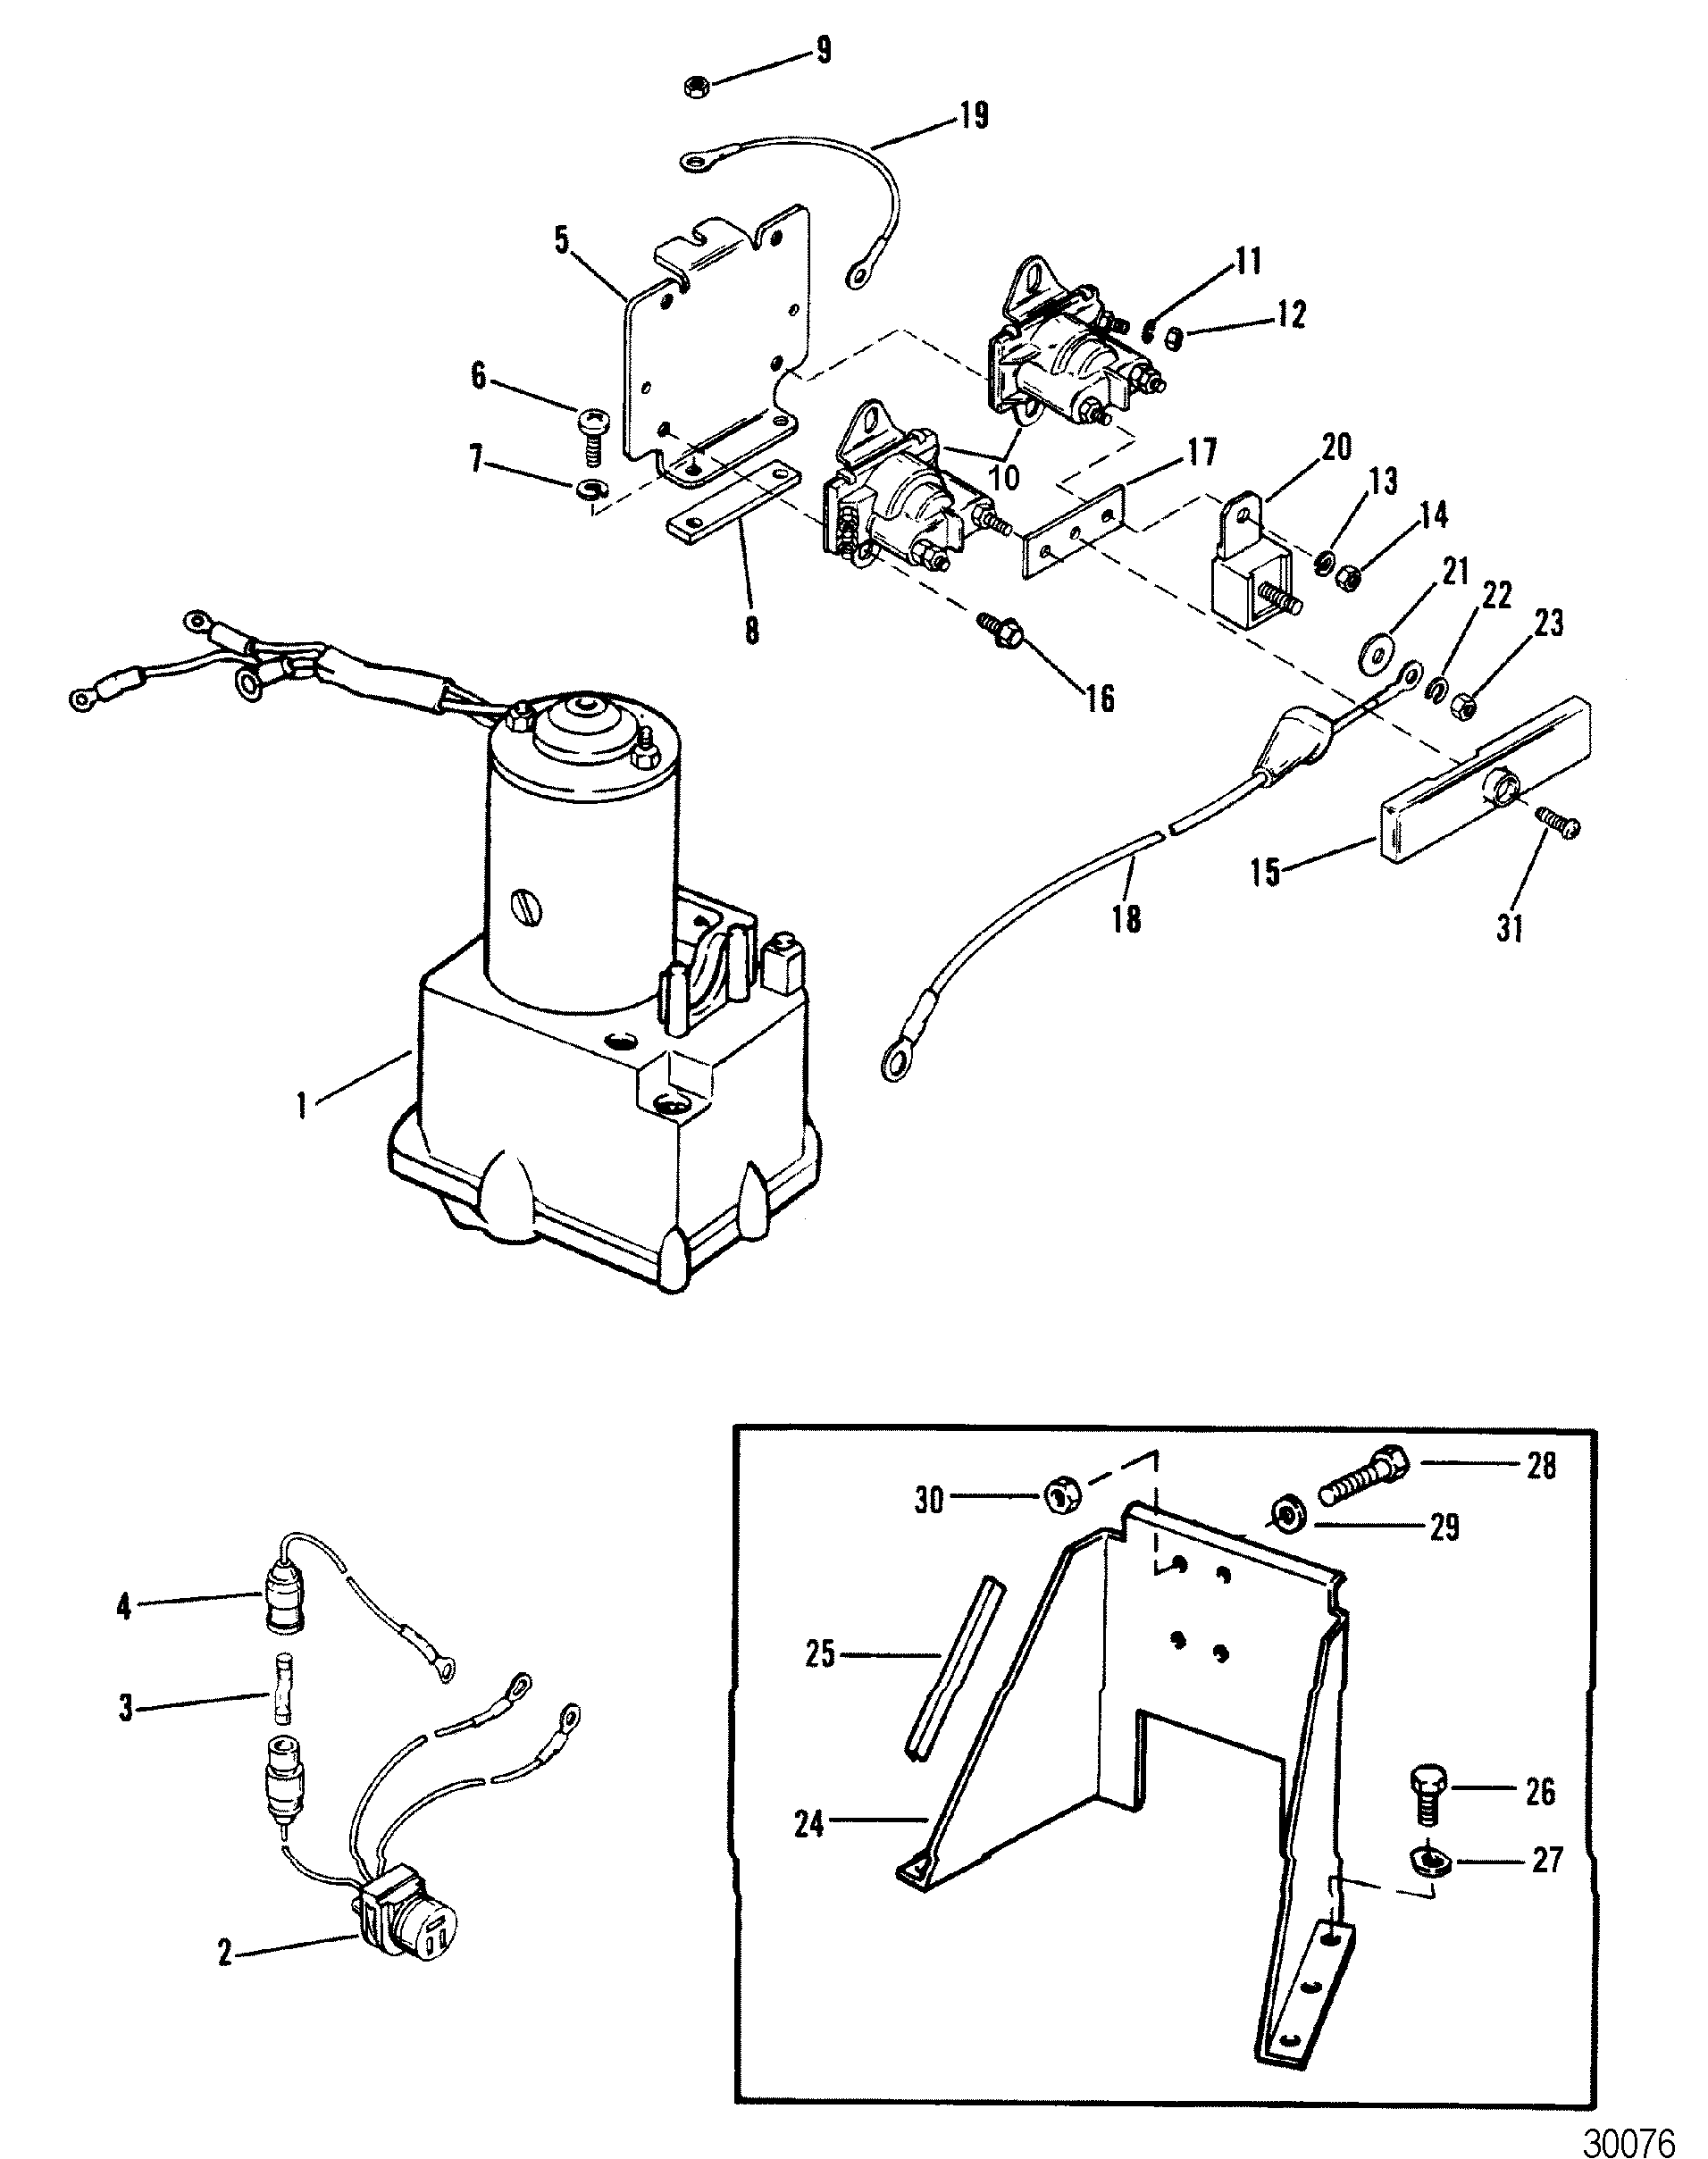 hydraulic pump and bracket pretolite pump for mercruiser r ... mercruiser pump diagram